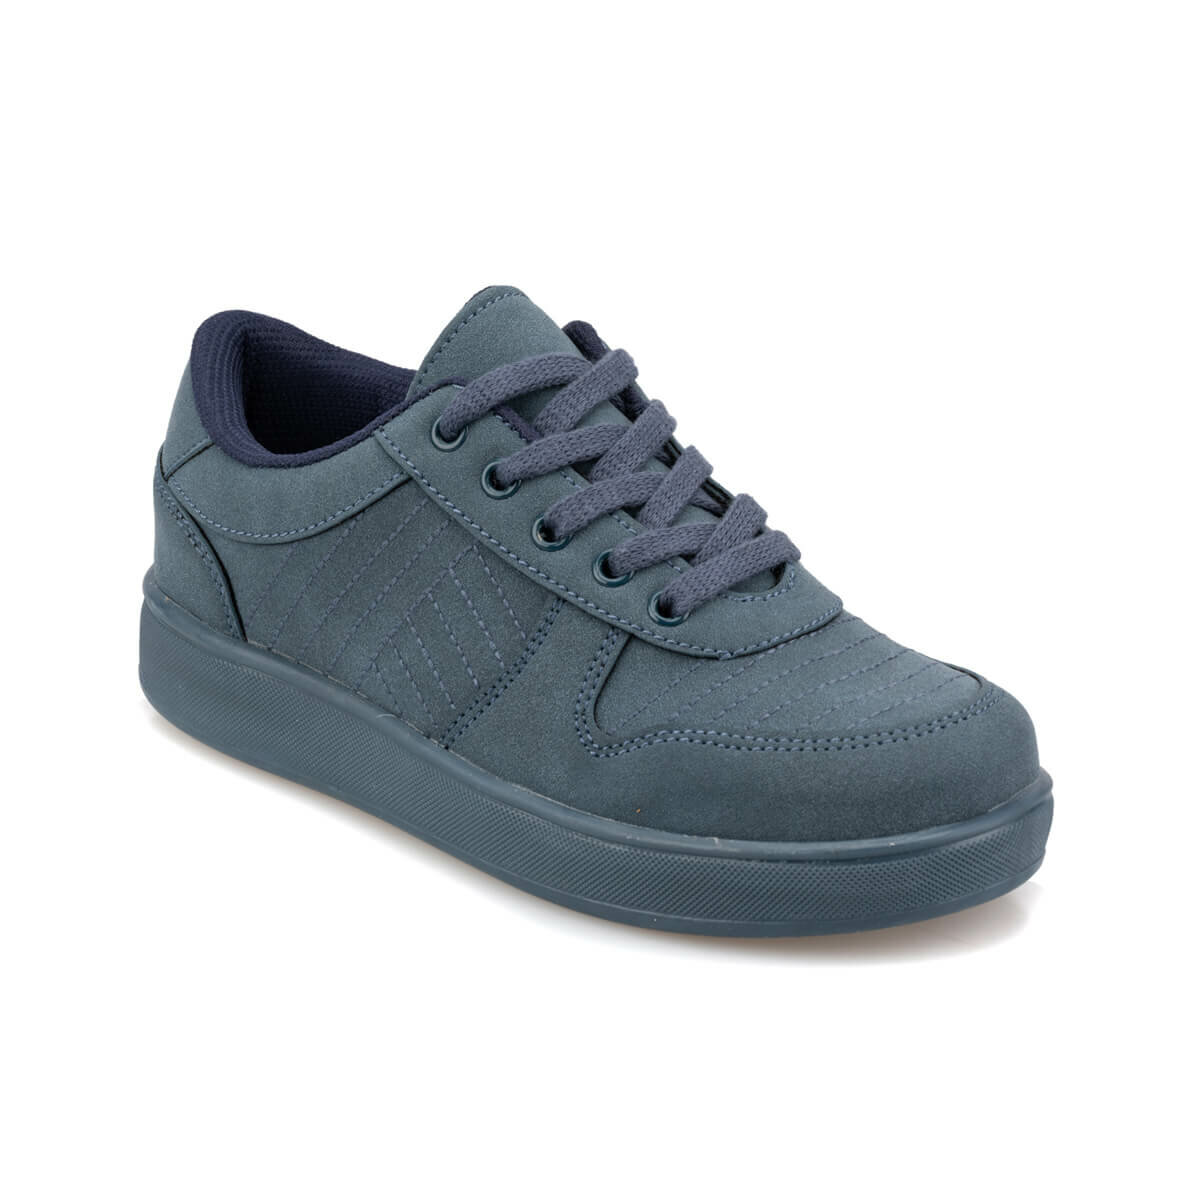 FLO 92.510858.F Blue Male Child Sneaker Shoes Polaris